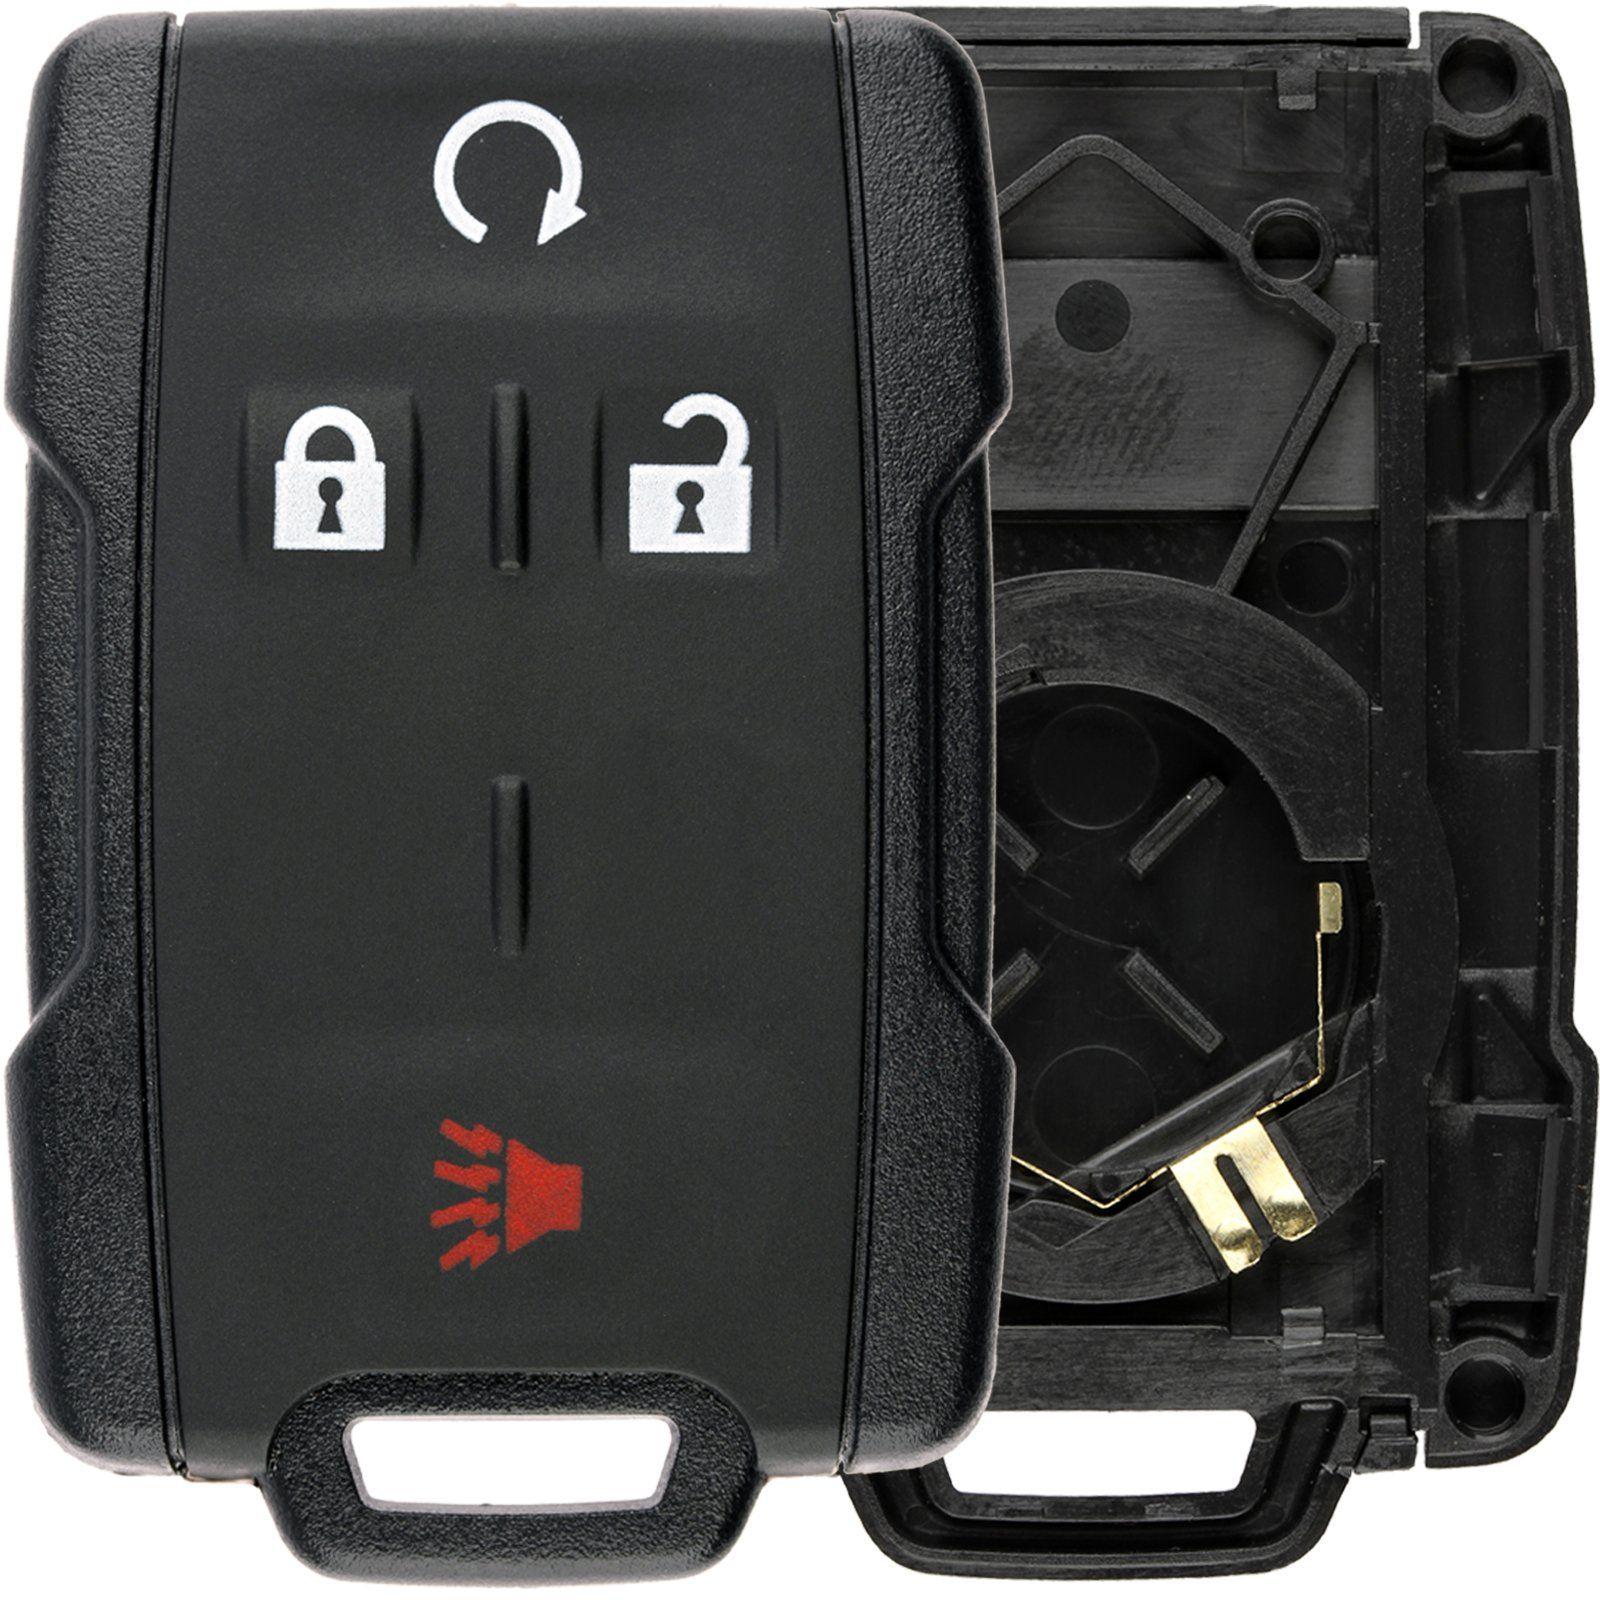 Keylessoption Keyless Entry Remote Control Car Key Fob Case Shell